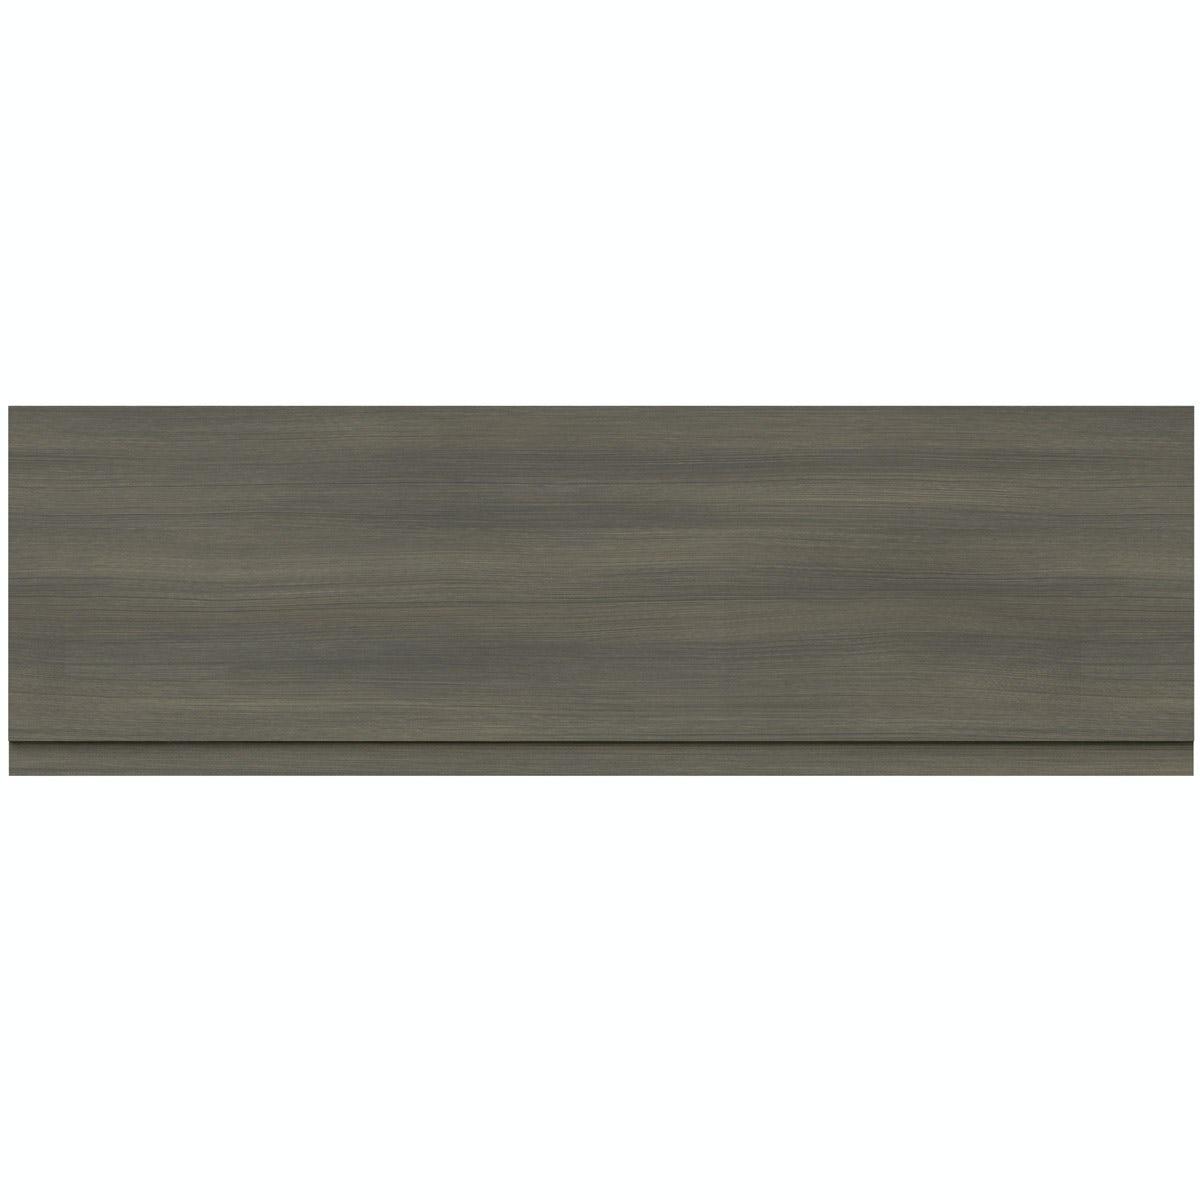 Wye walnut 1700 bath front panel